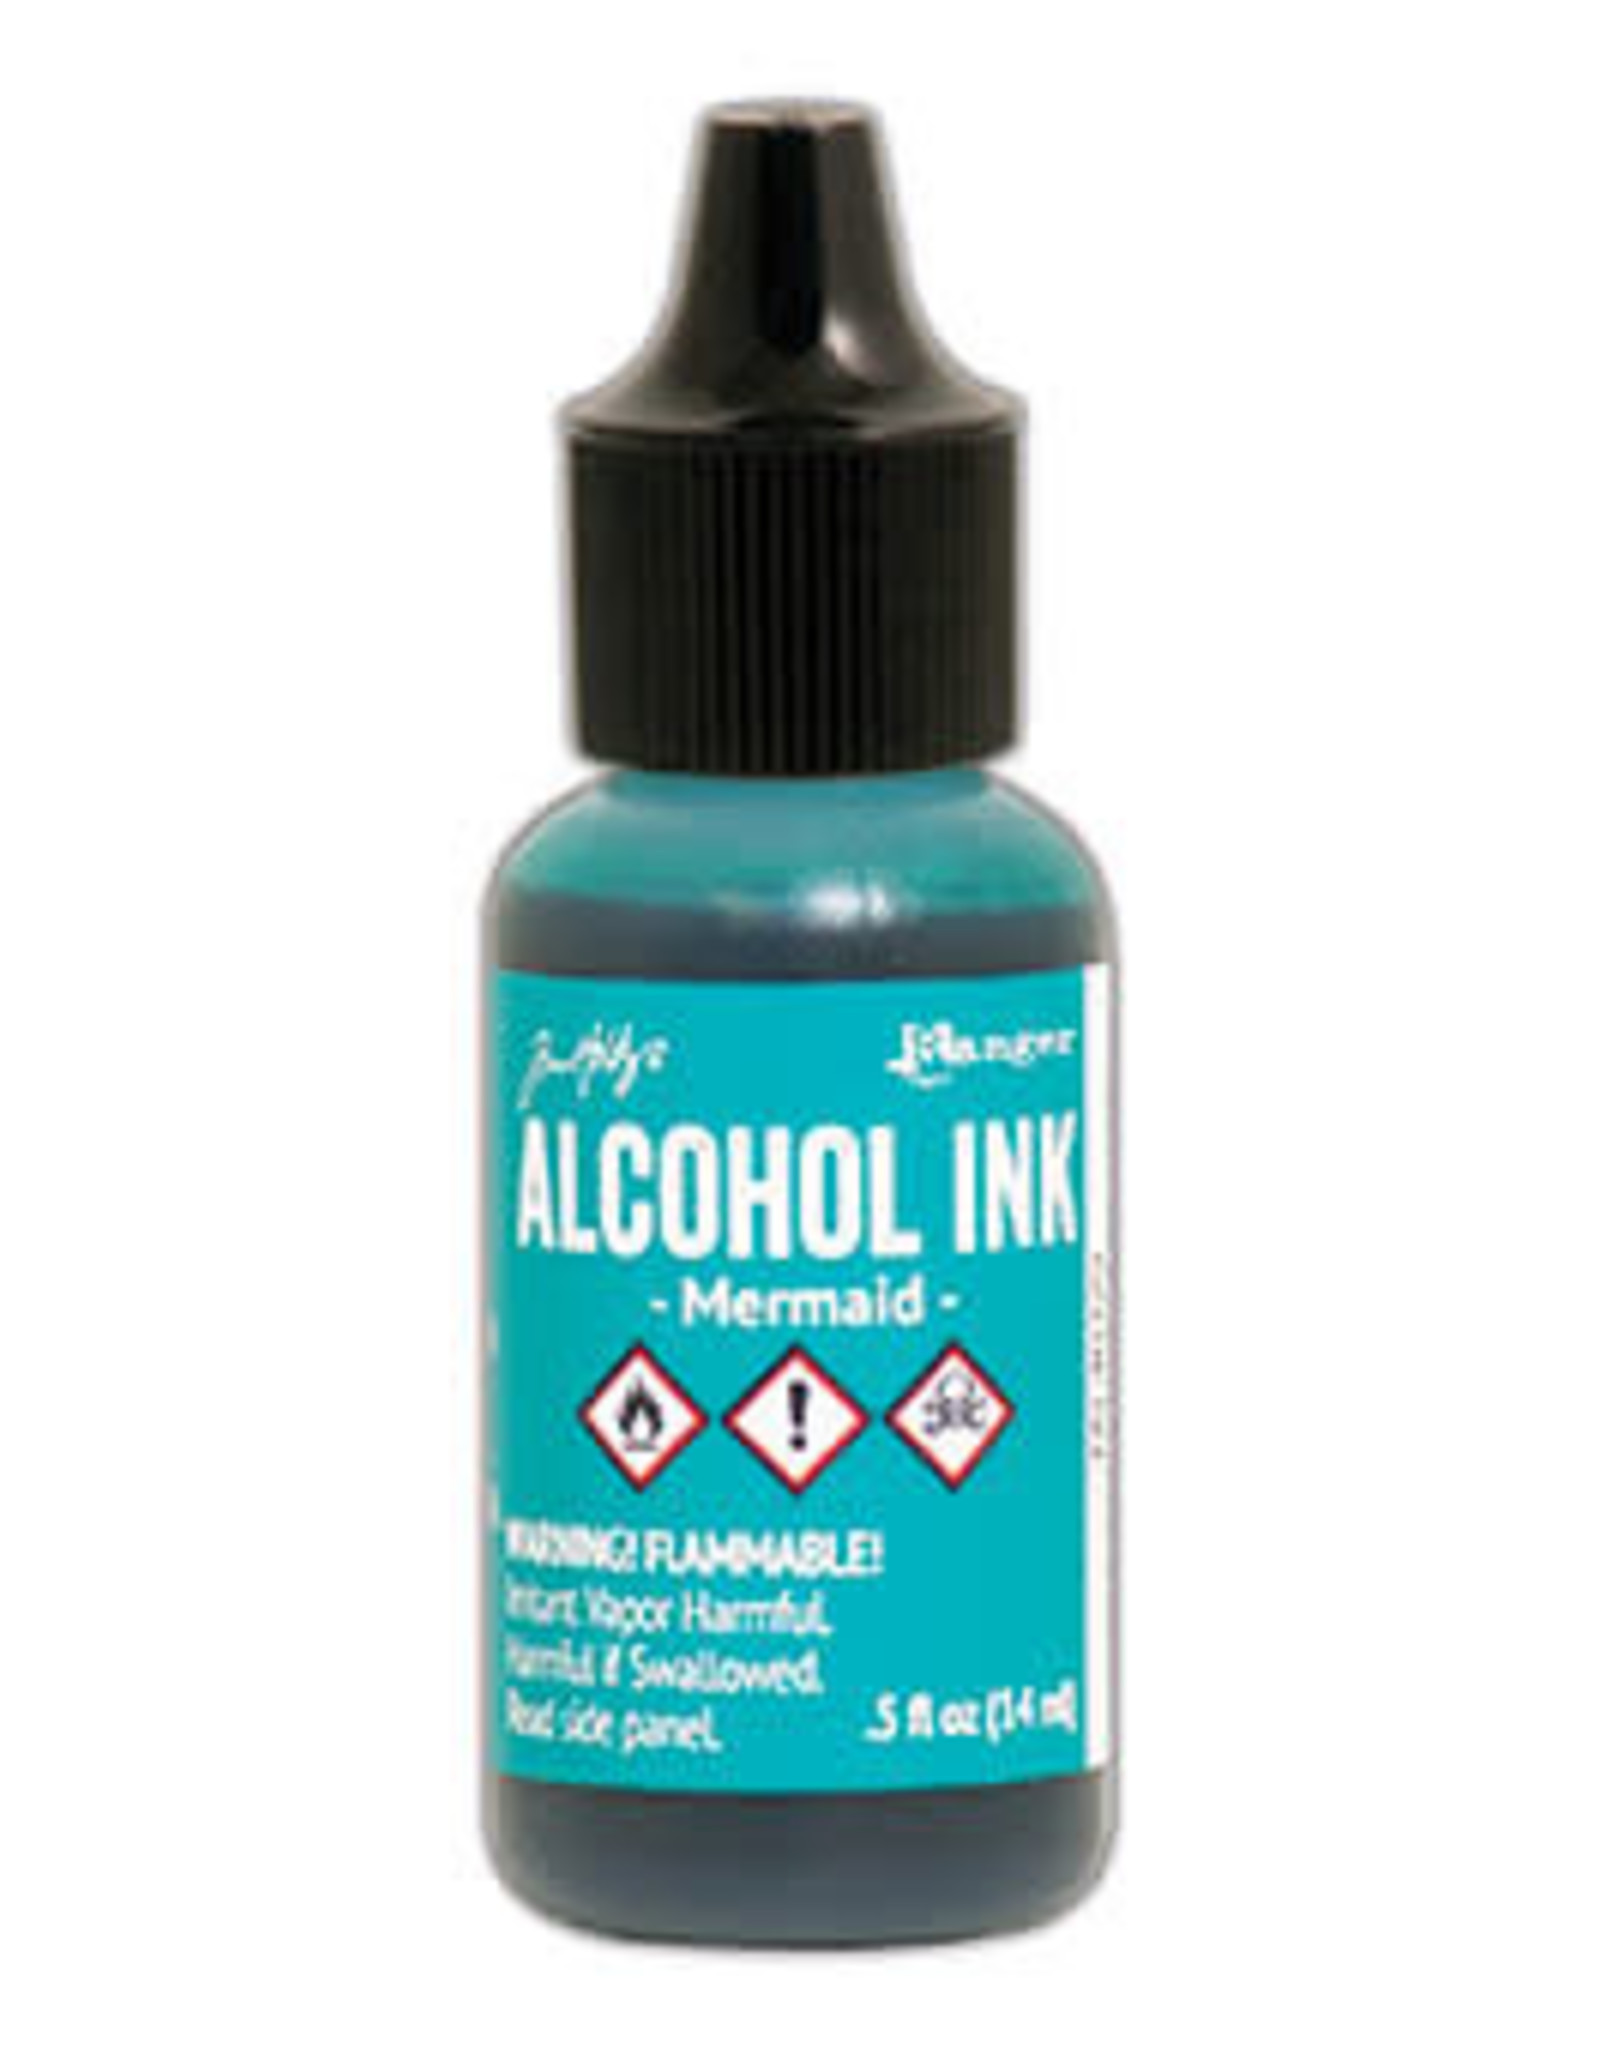 Tim Holtz Alcohol Ink 1/2 oz Mermaid